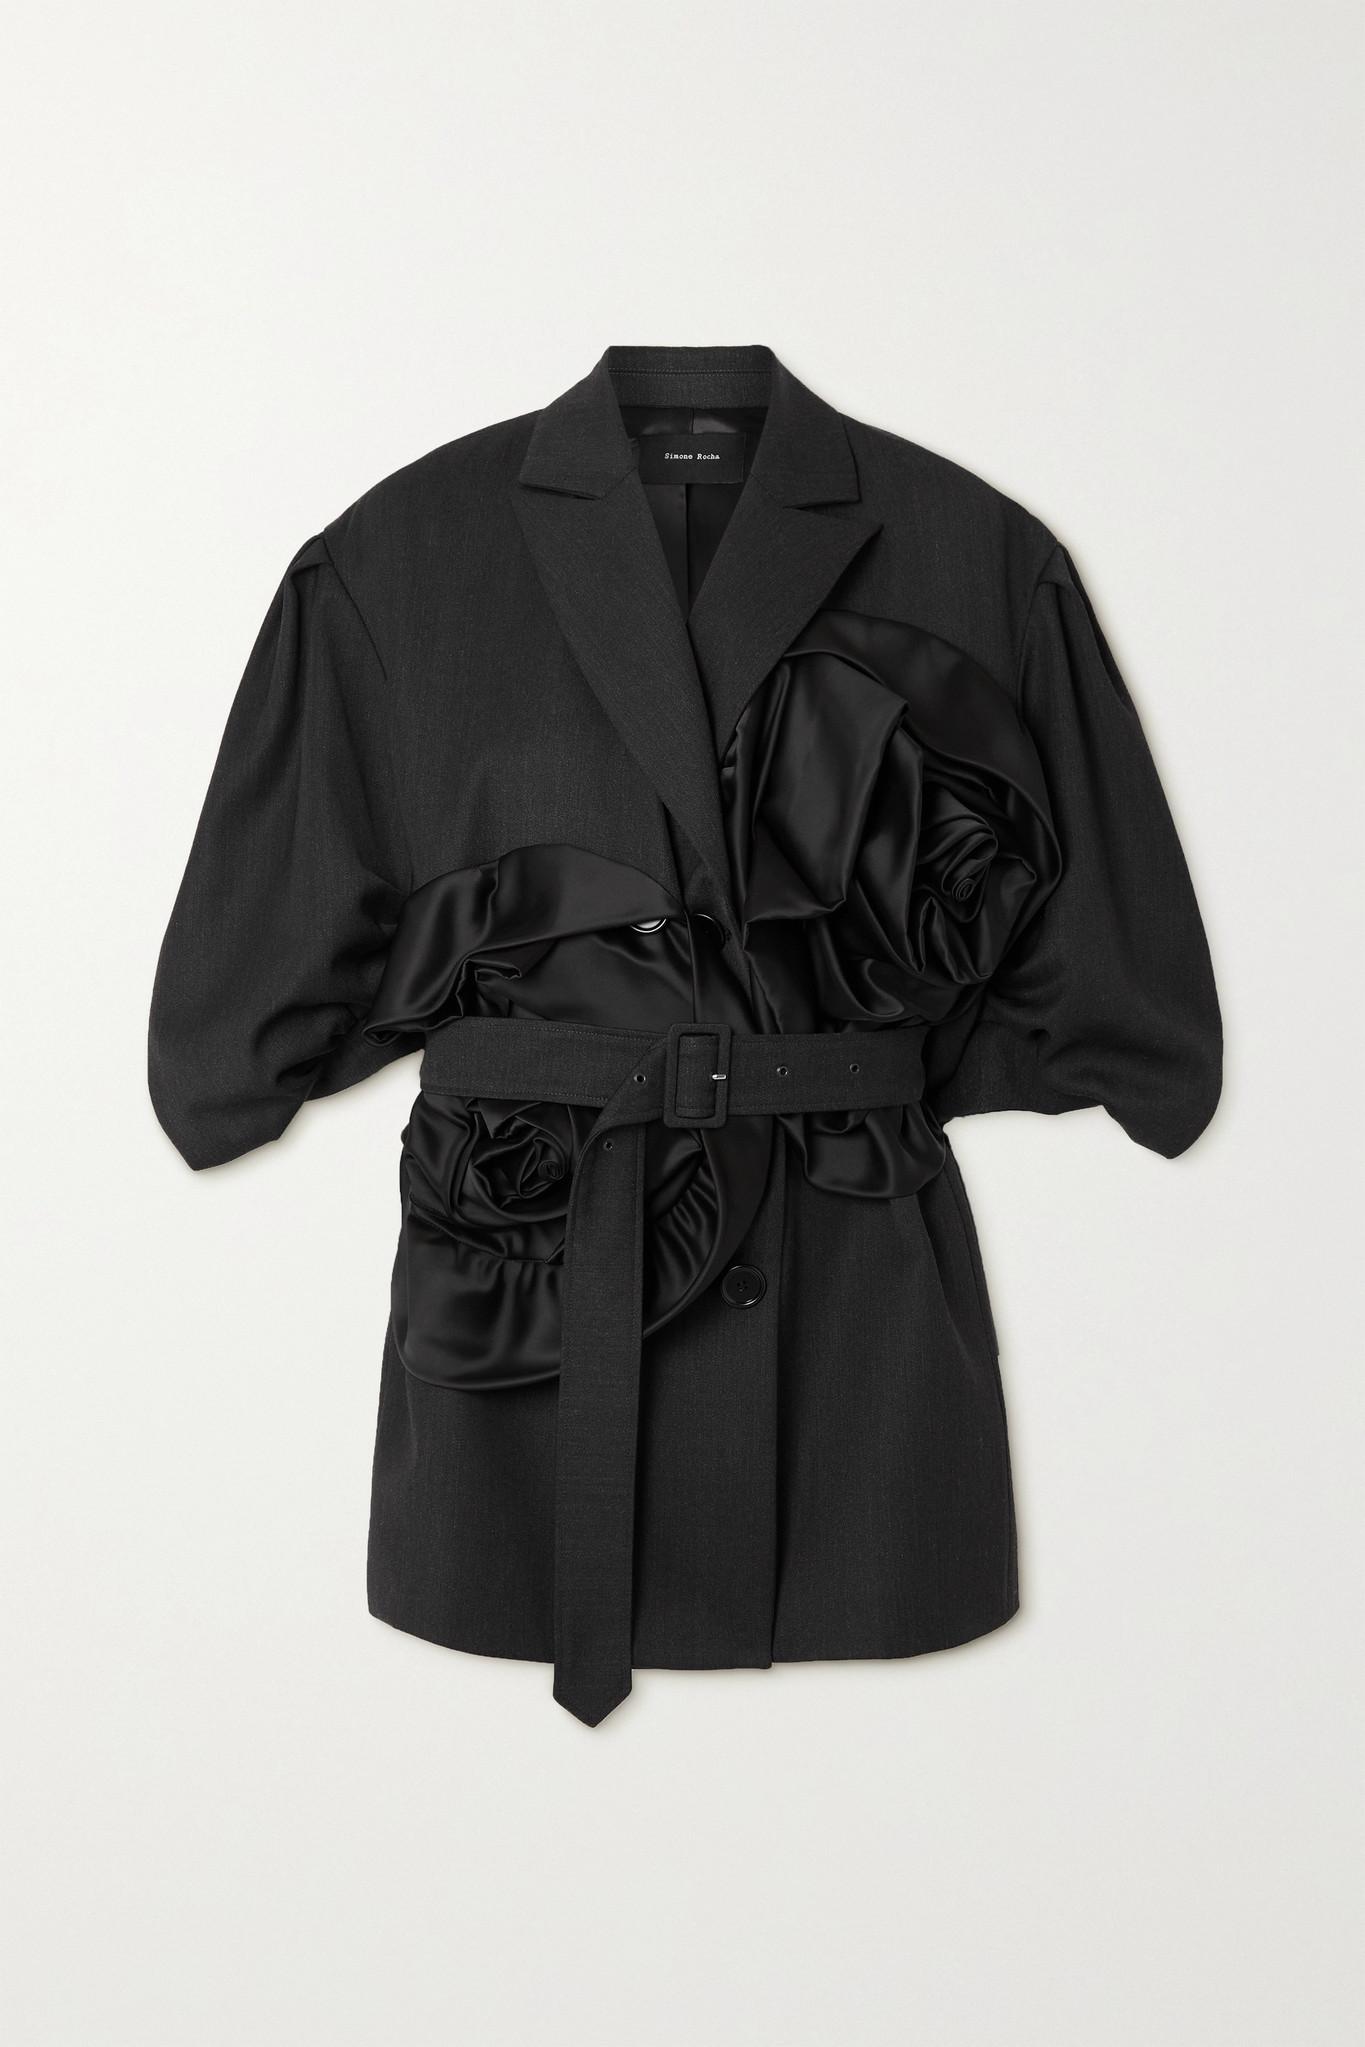 Simone Rocha - Belted Satin-trimmed Woven Jacket - Gray - UK6